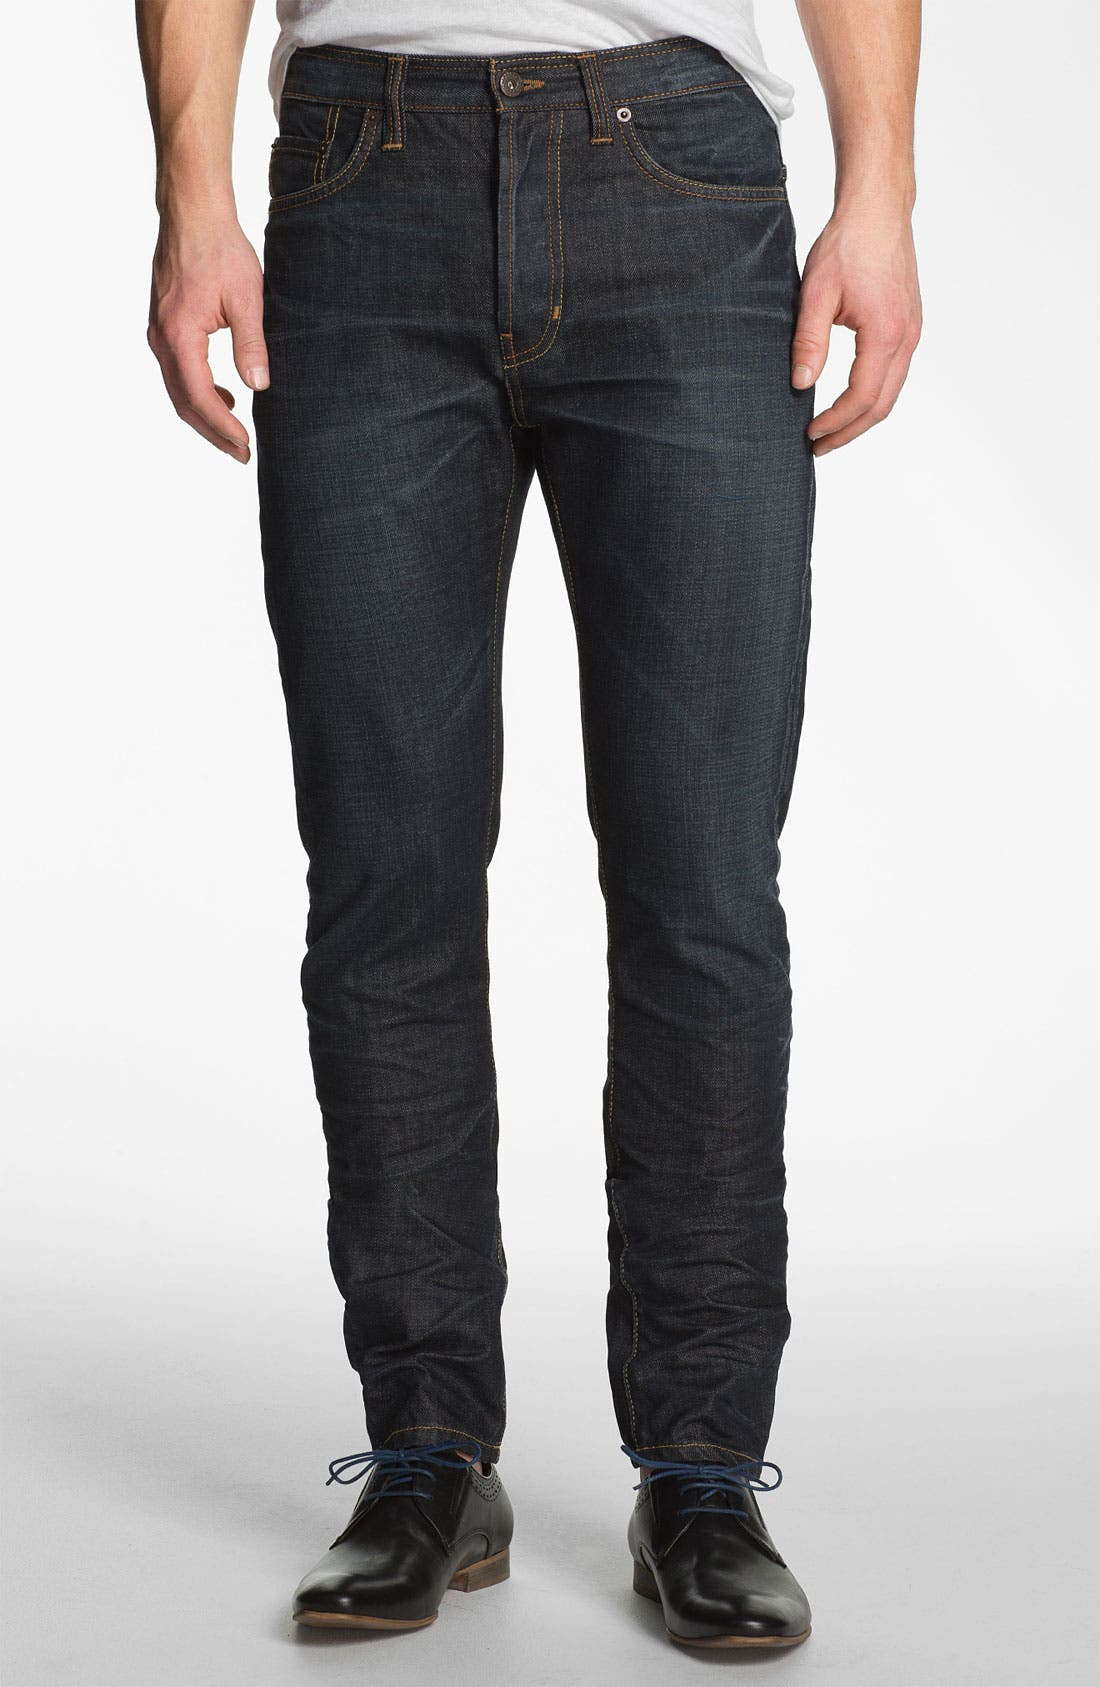 Alternate Image 2  - Natural Selection Denim 'Bruised' Slim Carrot Fit Jeans (Blue Rain)